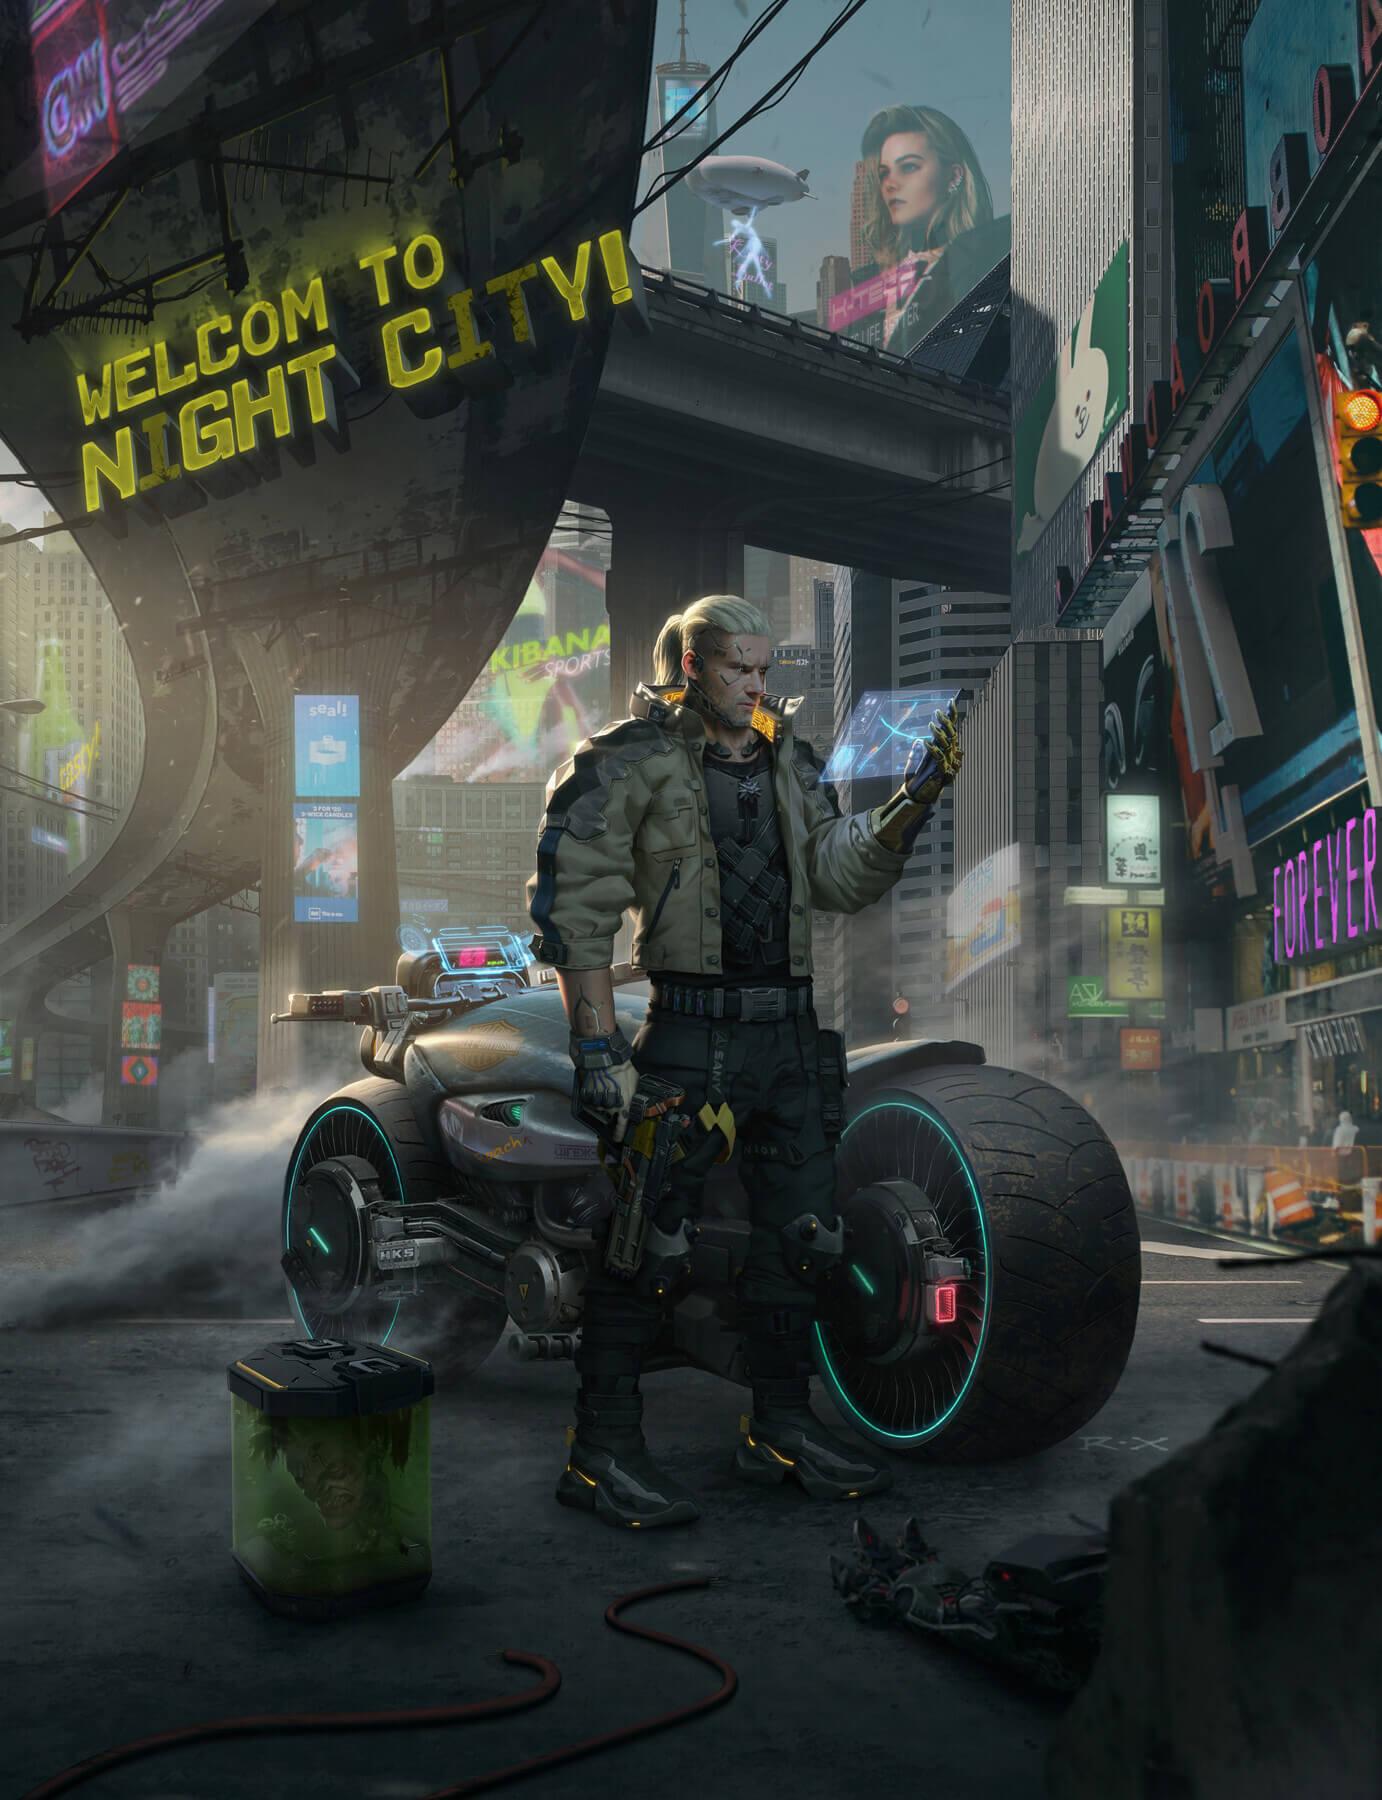 RX – The Witcher x Cyberpunk 2077